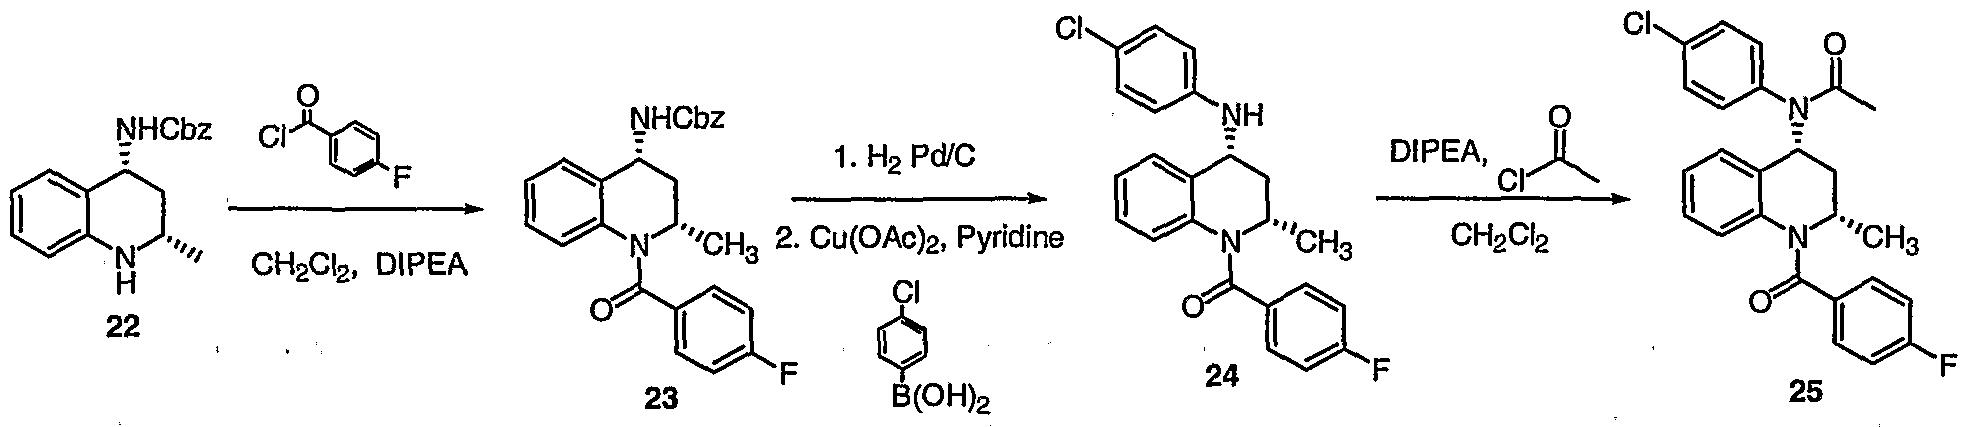 Patent WO2005100321A1 - Pgd2  N Ethylbutanamide